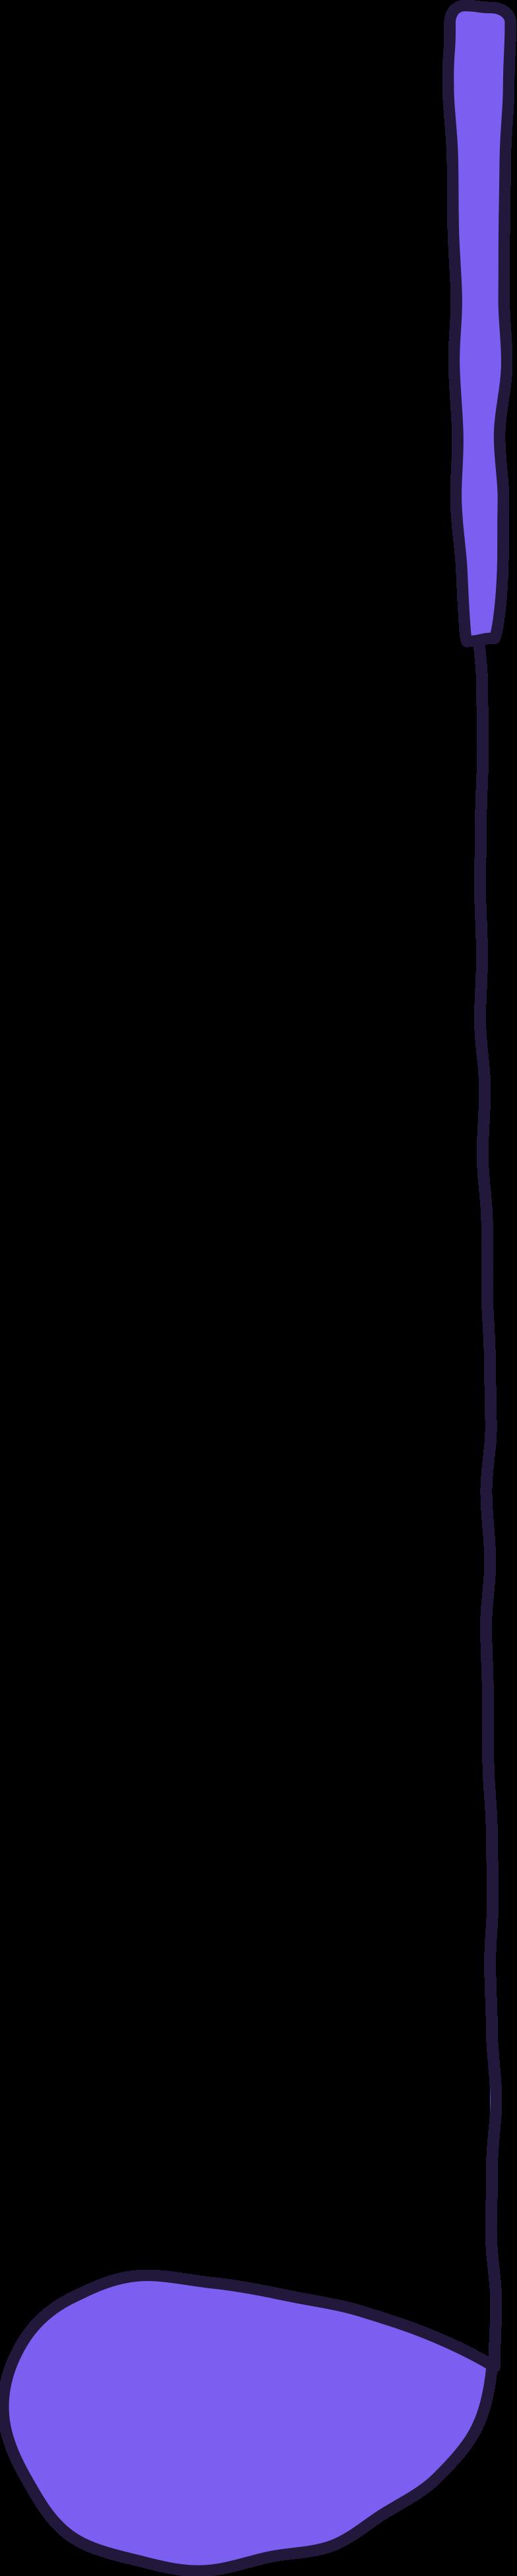 golf stick Clipart illustration in PNG, SVG